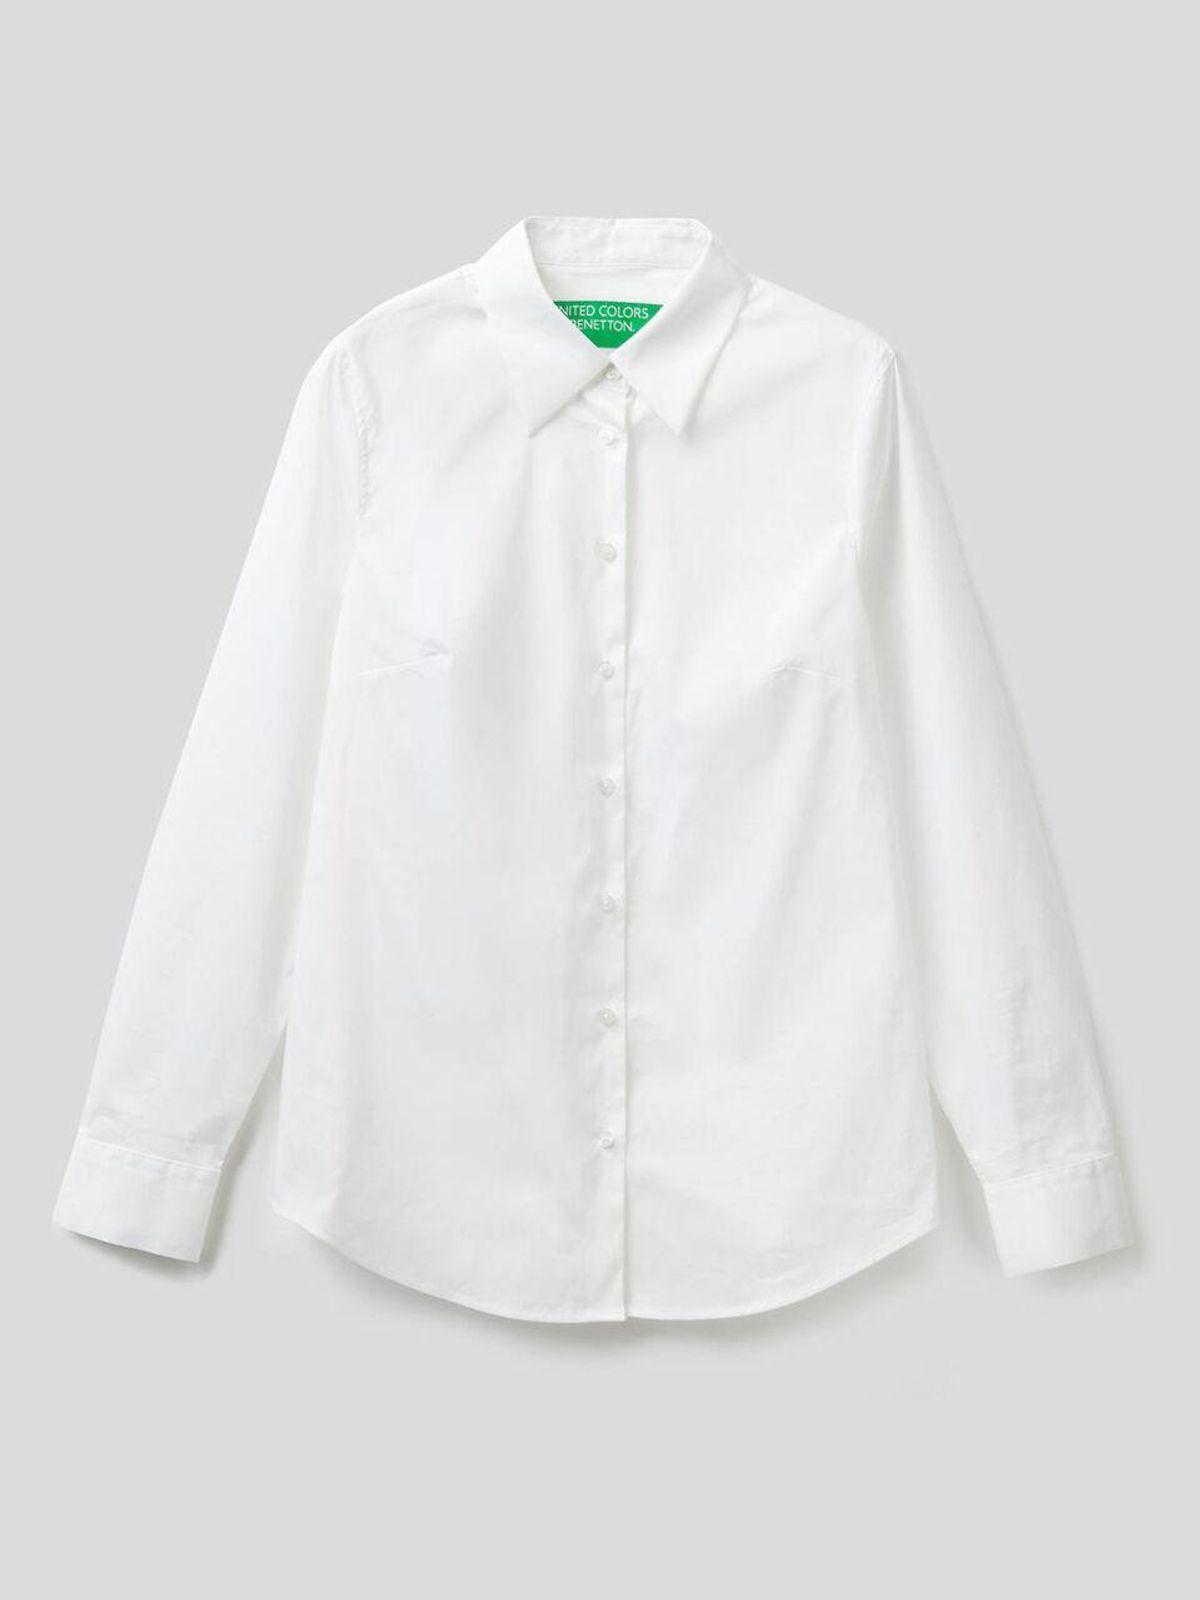 Shirt in Stretch Cotton-Blend